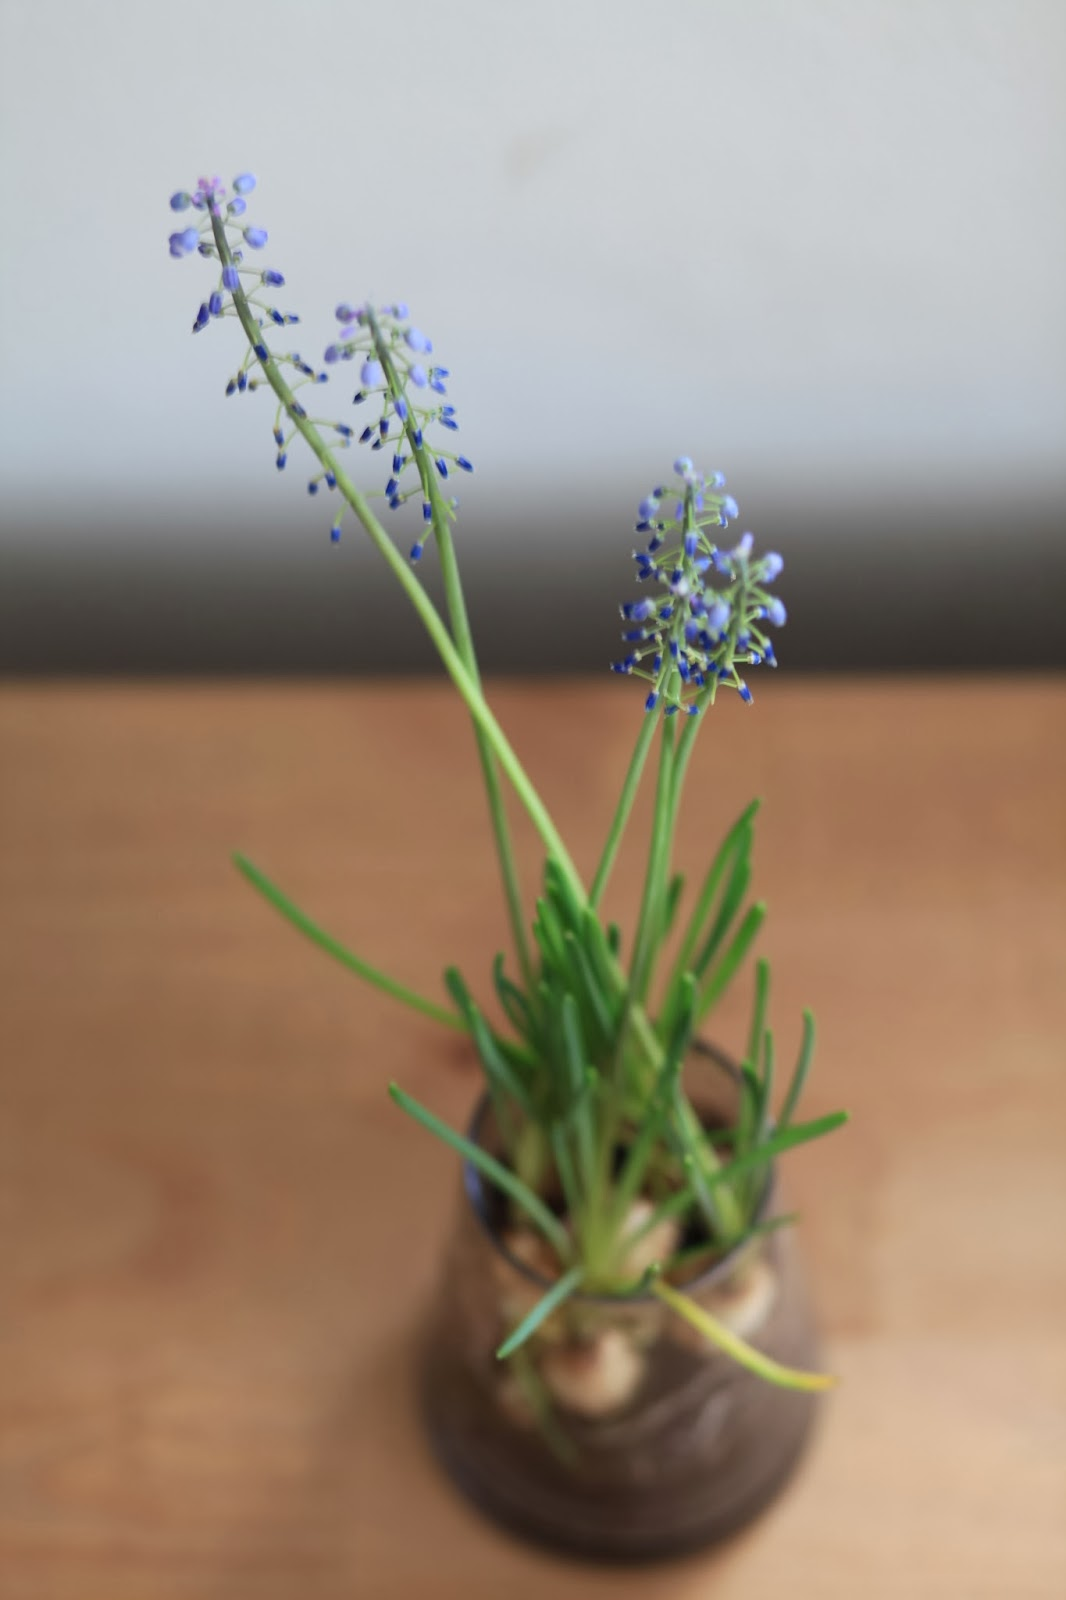 deko hol dir den fr hling ins haus oder zwiebelblumen im glas. Black Bedroom Furniture Sets. Home Design Ideas